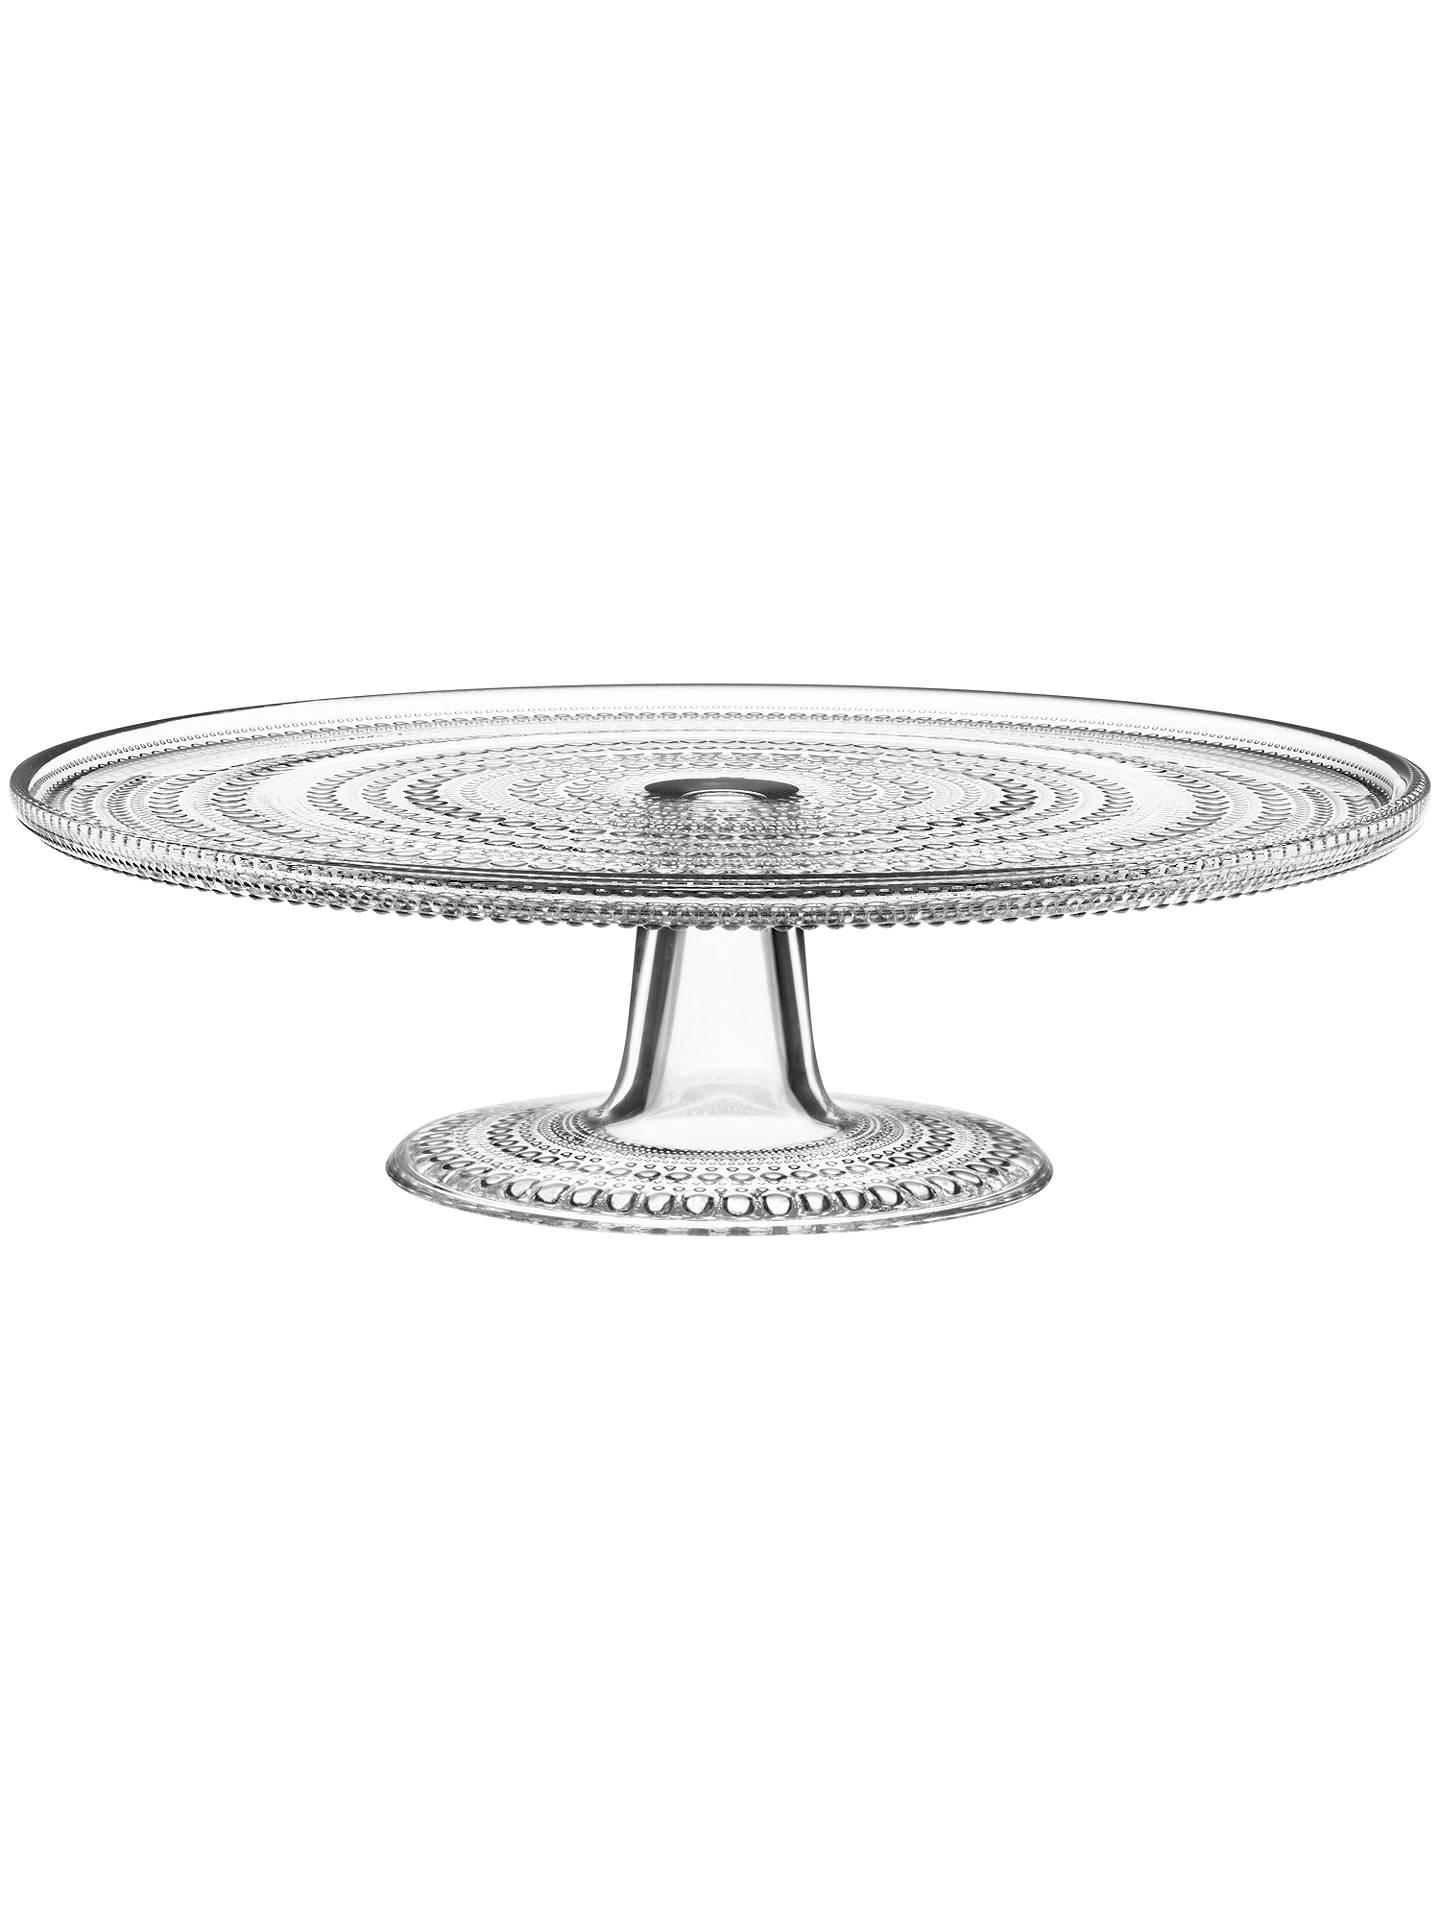 iittala kastehelmi glass cake stand clear at john lewis. Black Bedroom Furniture Sets. Home Design Ideas